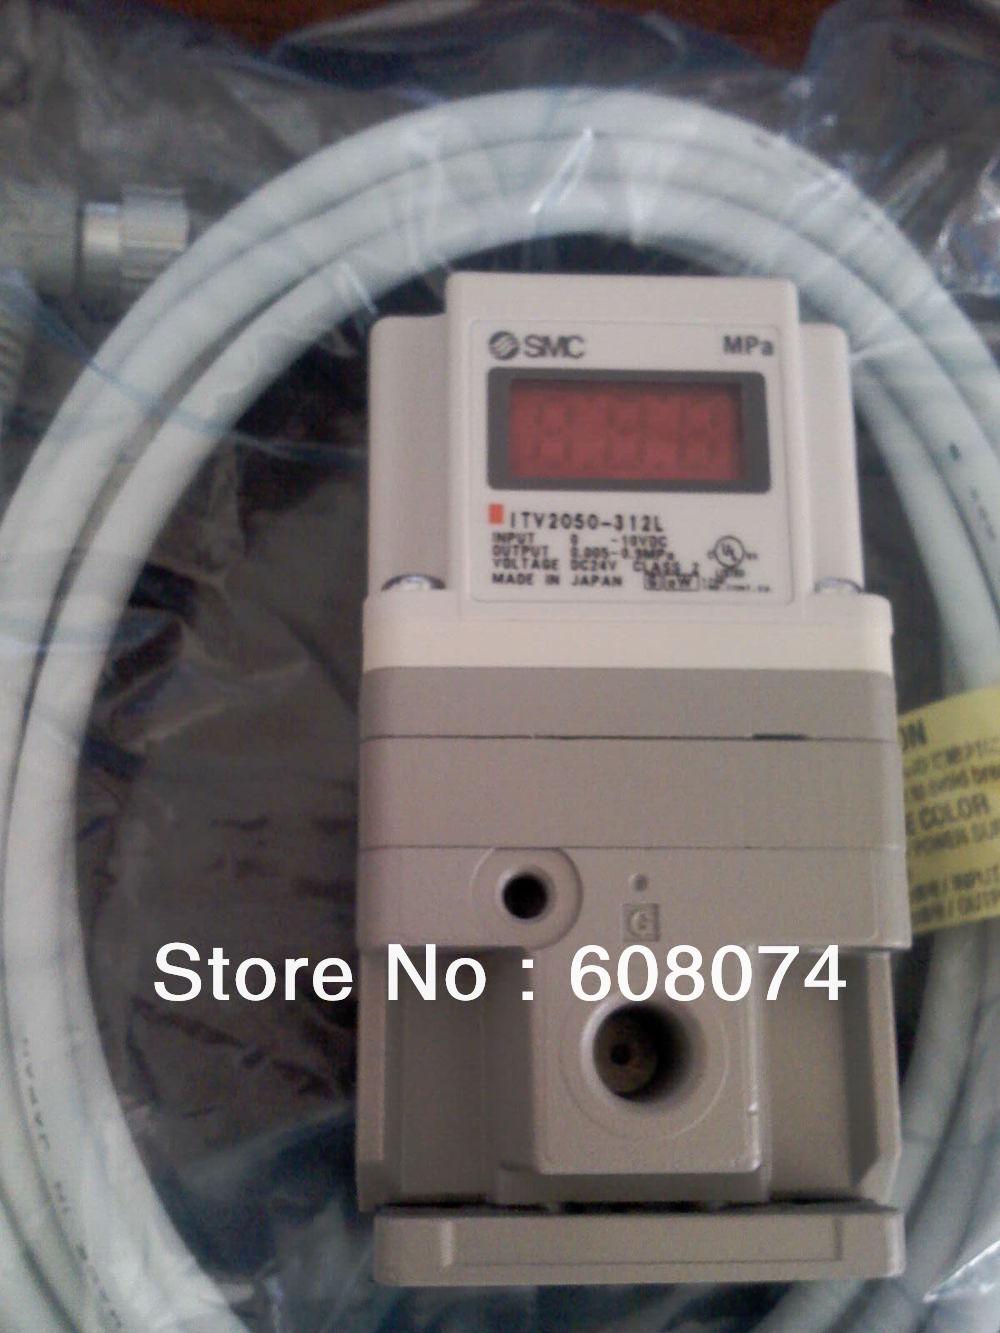 SMC   ELECTRO PNEUMATIC REGULATOR   ITV2030-312L3  , 24VDC 1/4 PORT 0.005~0.5MPa  0~10V pneumatic jet chisel jex 24